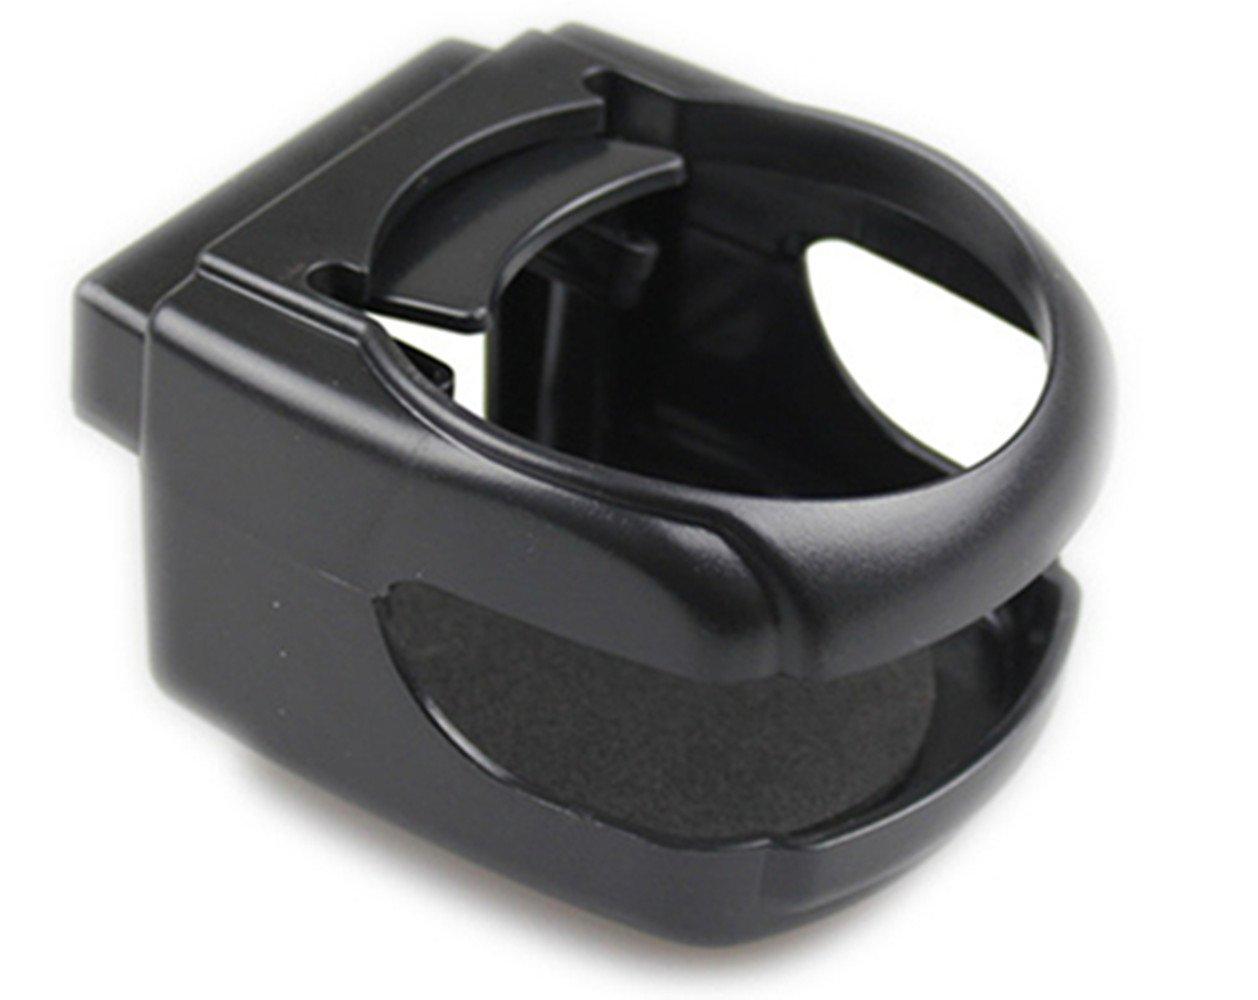 RANDER New Seat Wedge Cup Holder Multi-functional beverage rack for Universal Adjustable Car (Black(2 pcs))